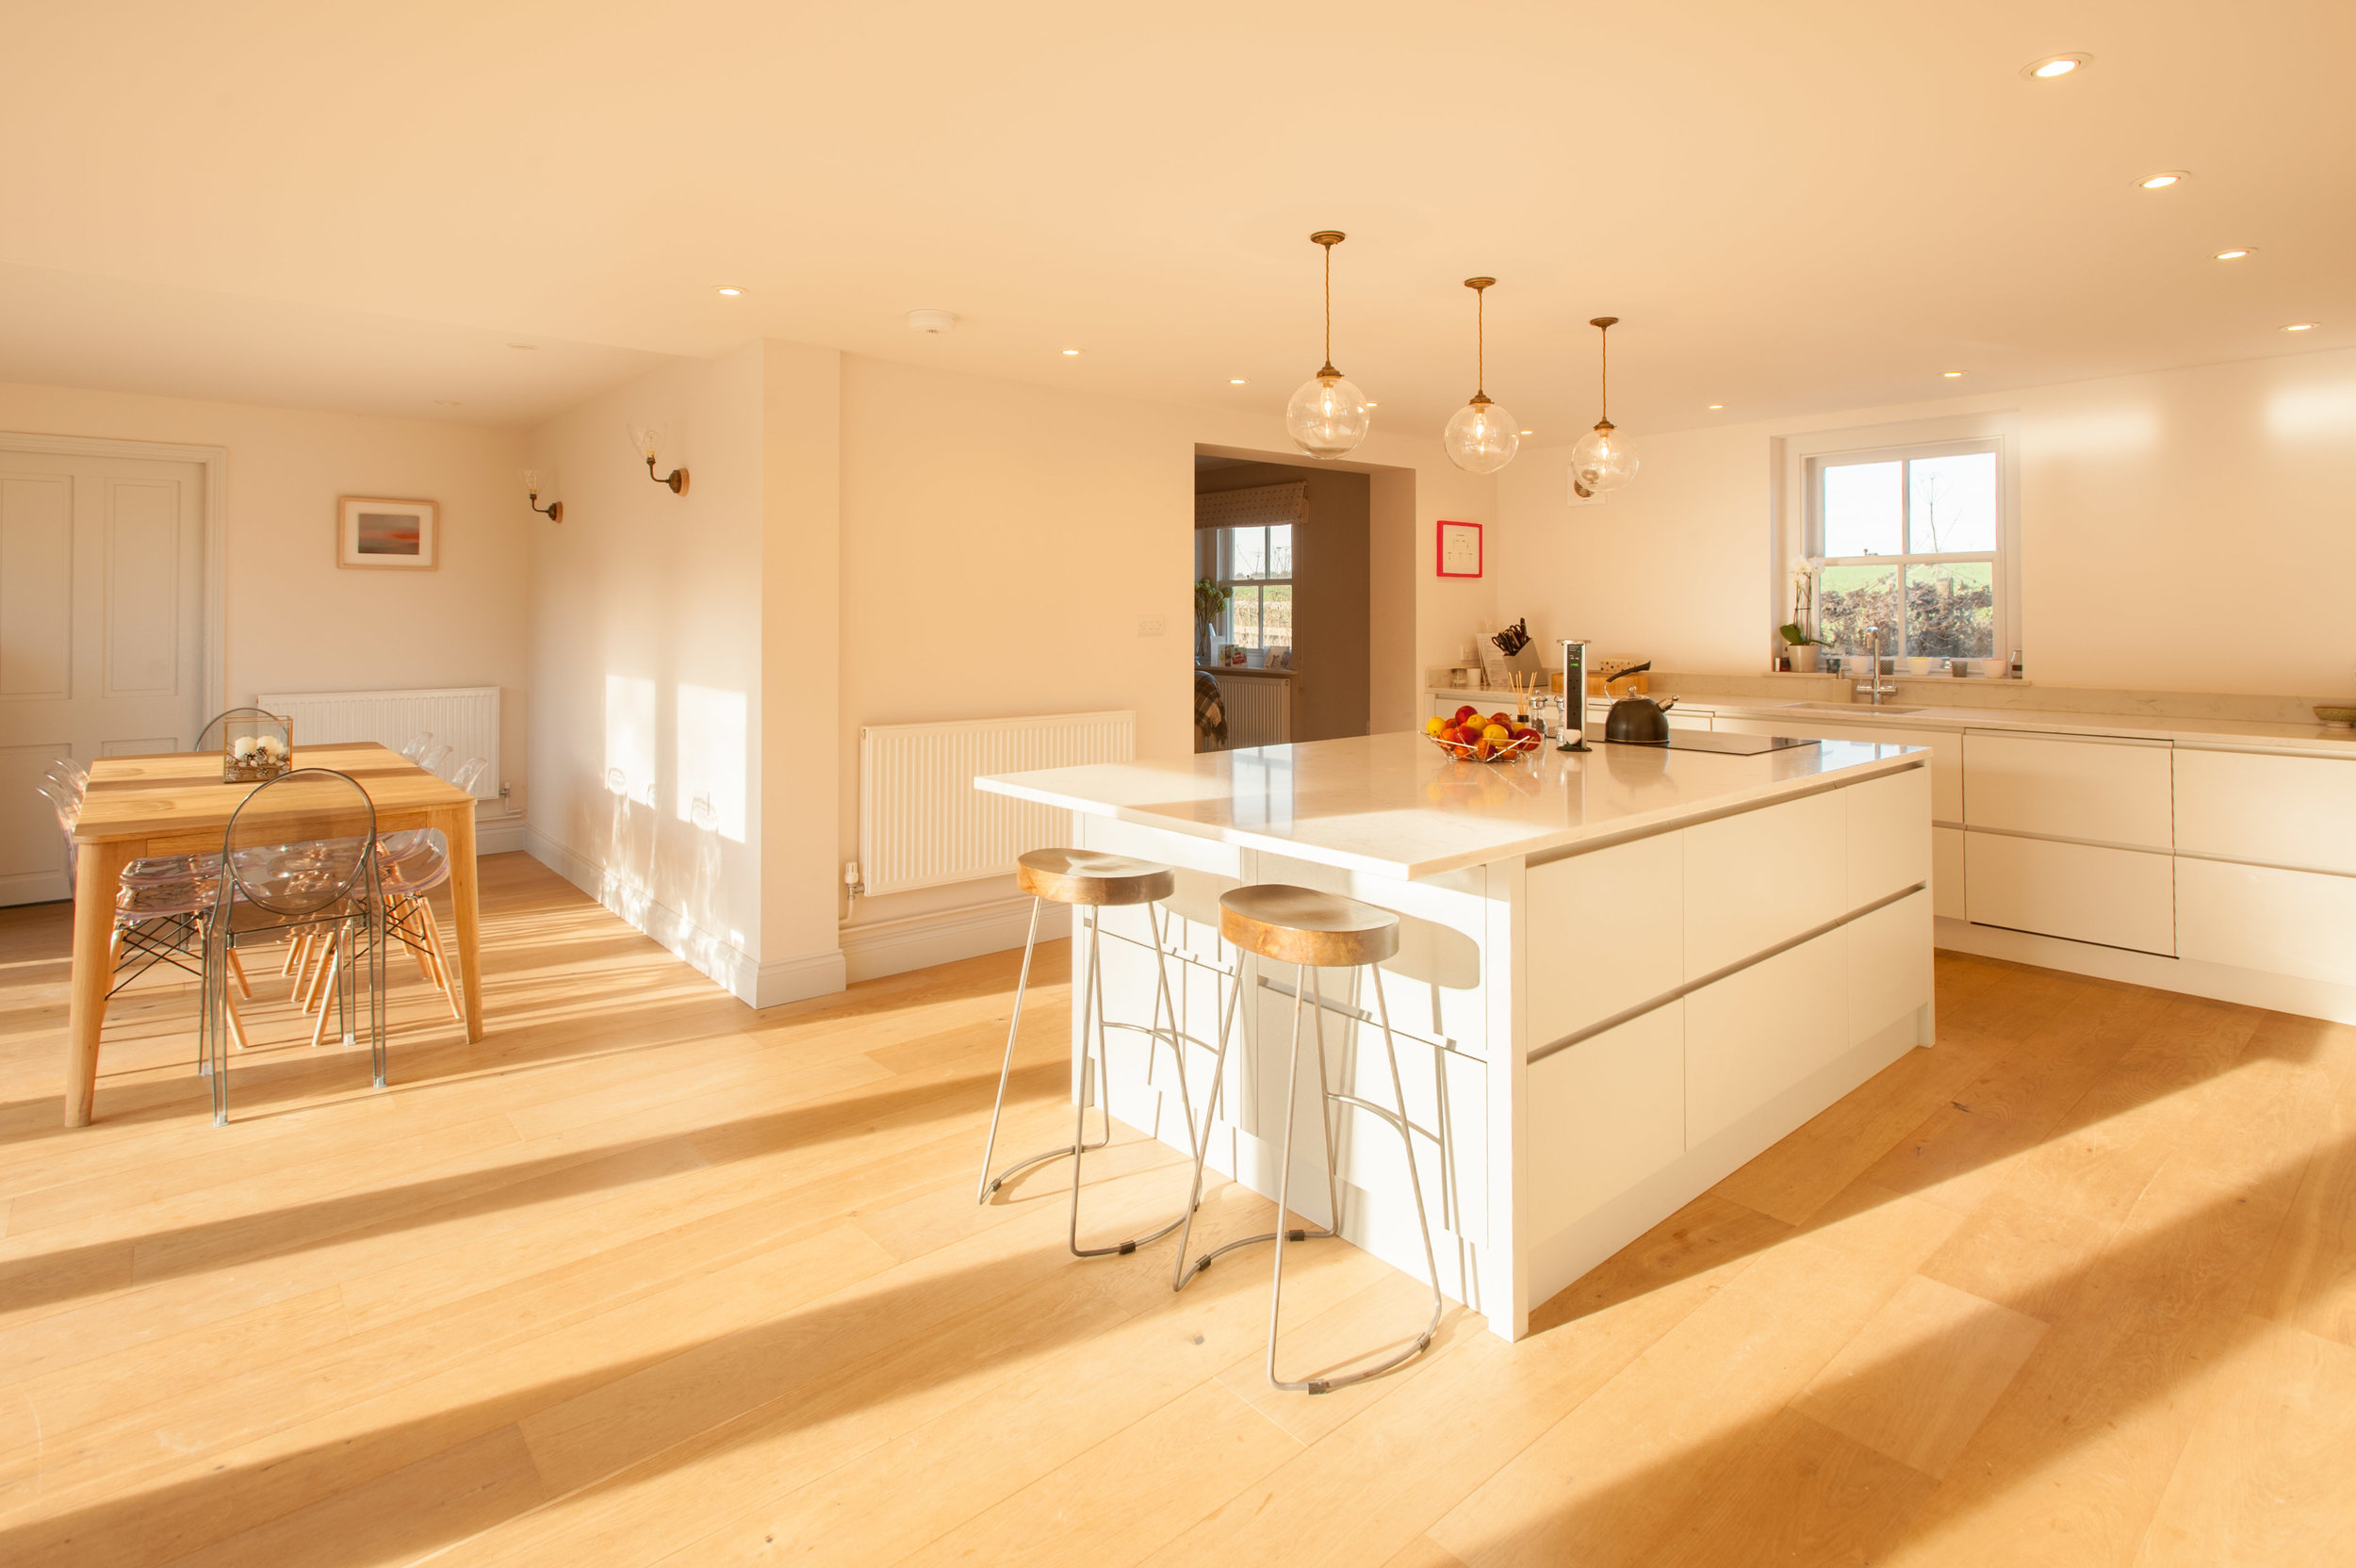 kitchen-saunders-0095-HDR.jpg